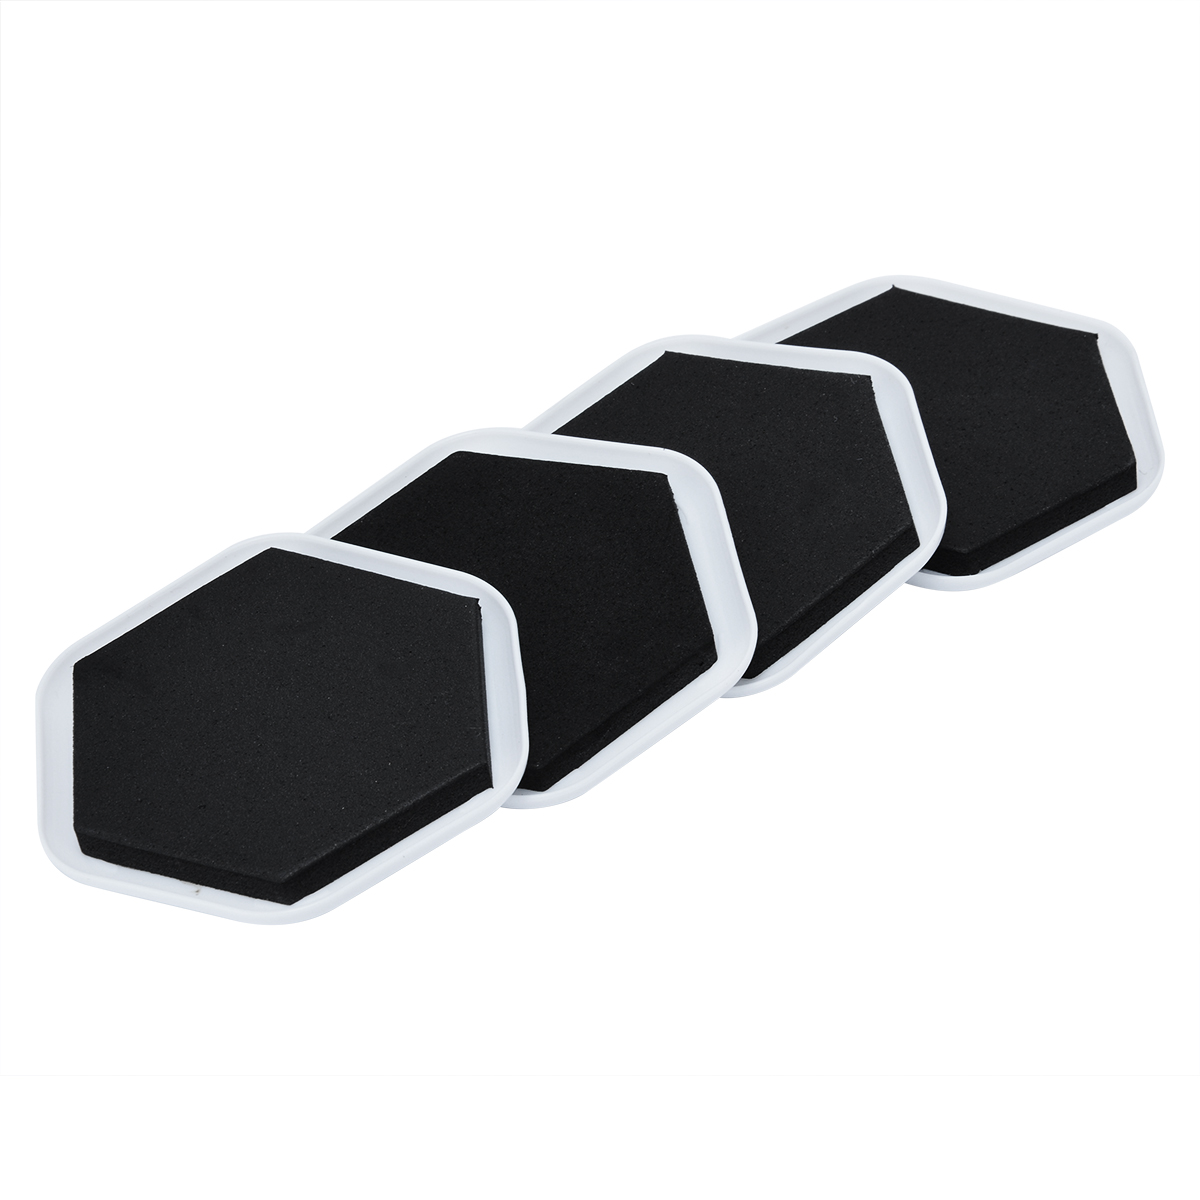 4pcs Heavy Duty Furniture Moving Sliders Pad Floor